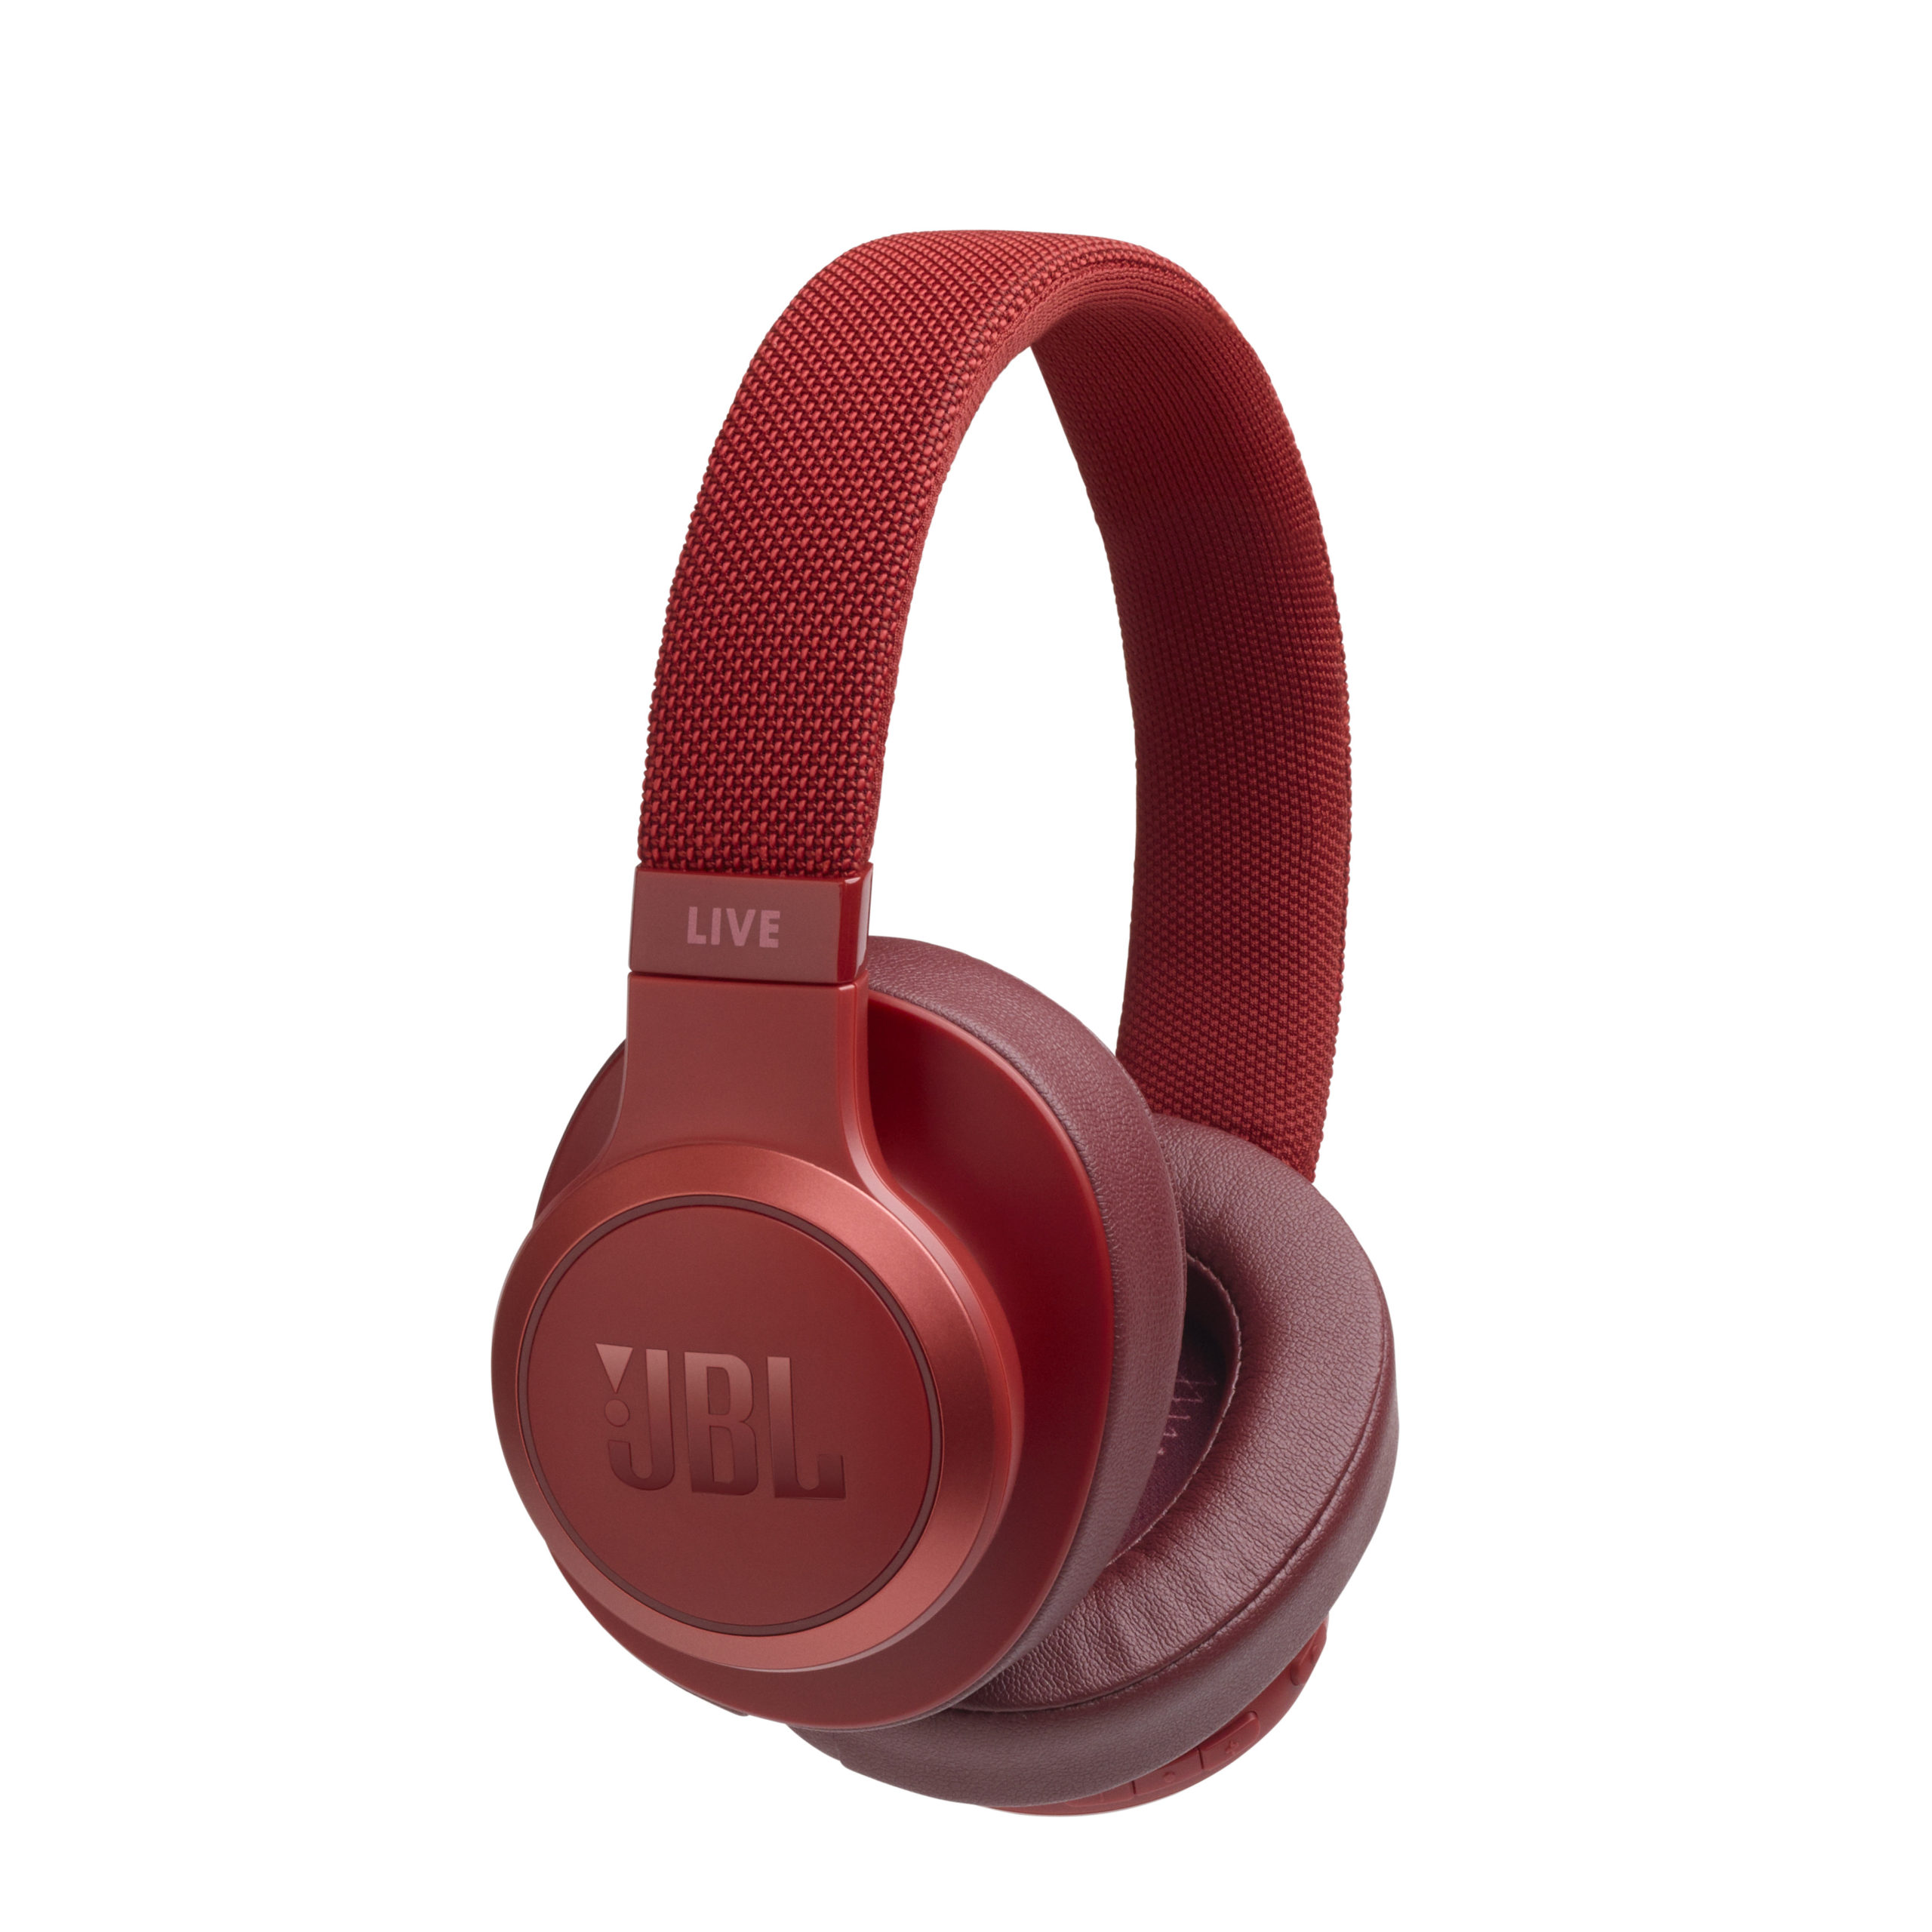 JBL Live 500BT Wireless Headphone - Red